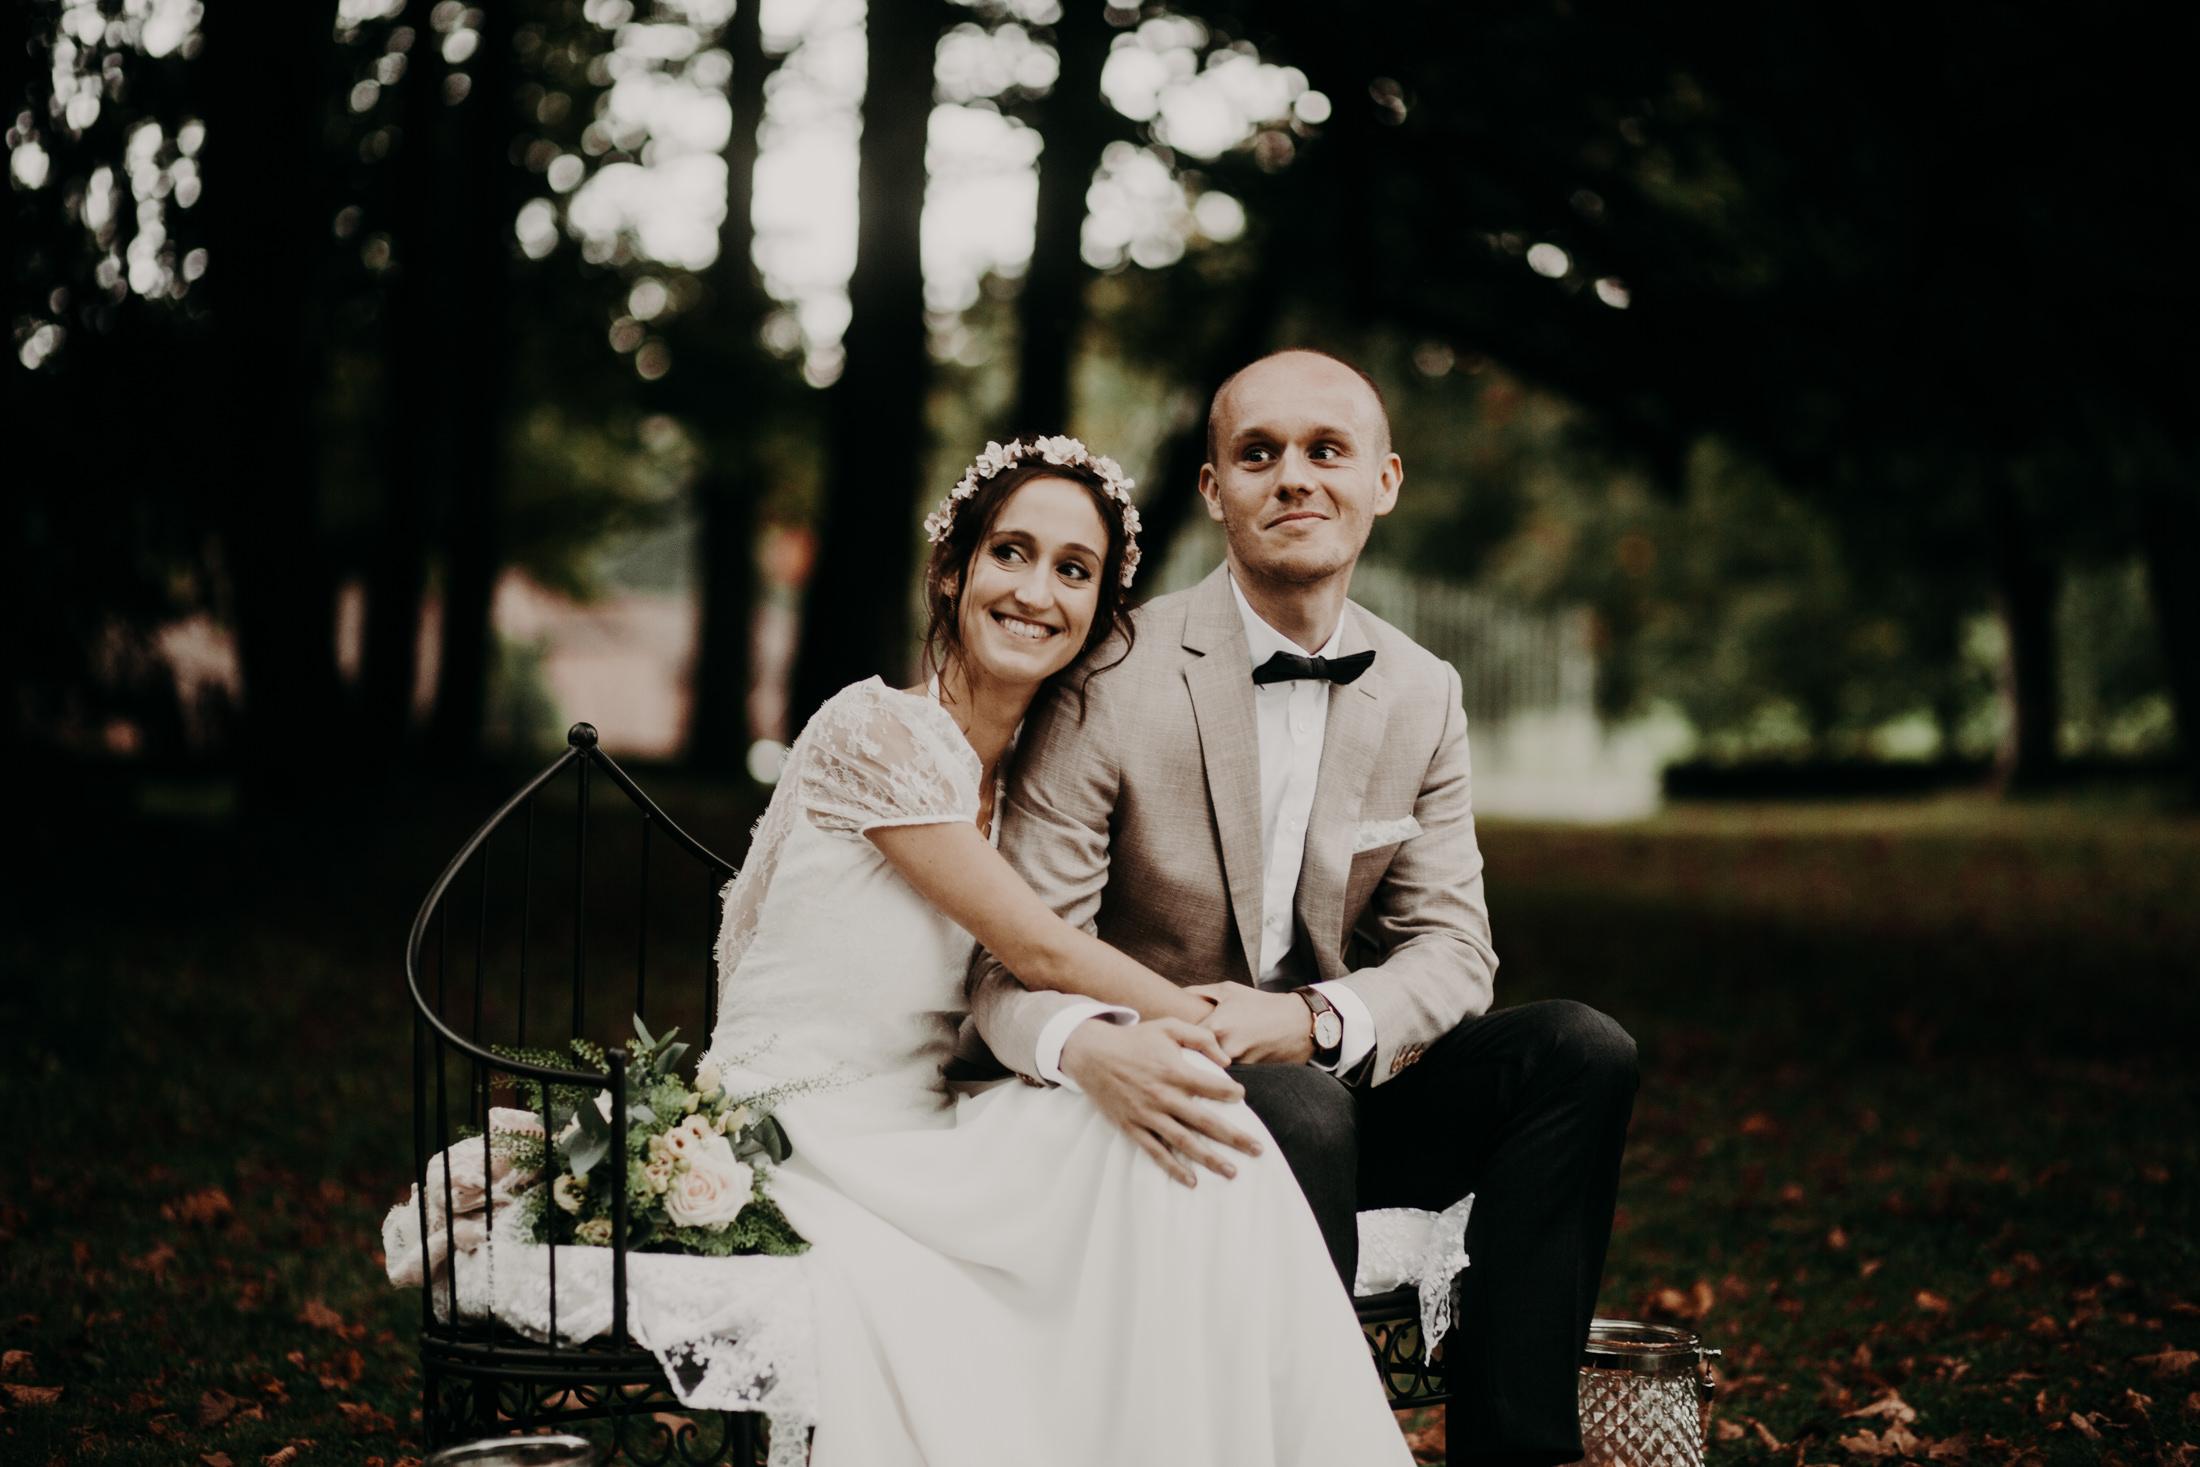 Mariage auvergne photographe wedding_-59.jpg